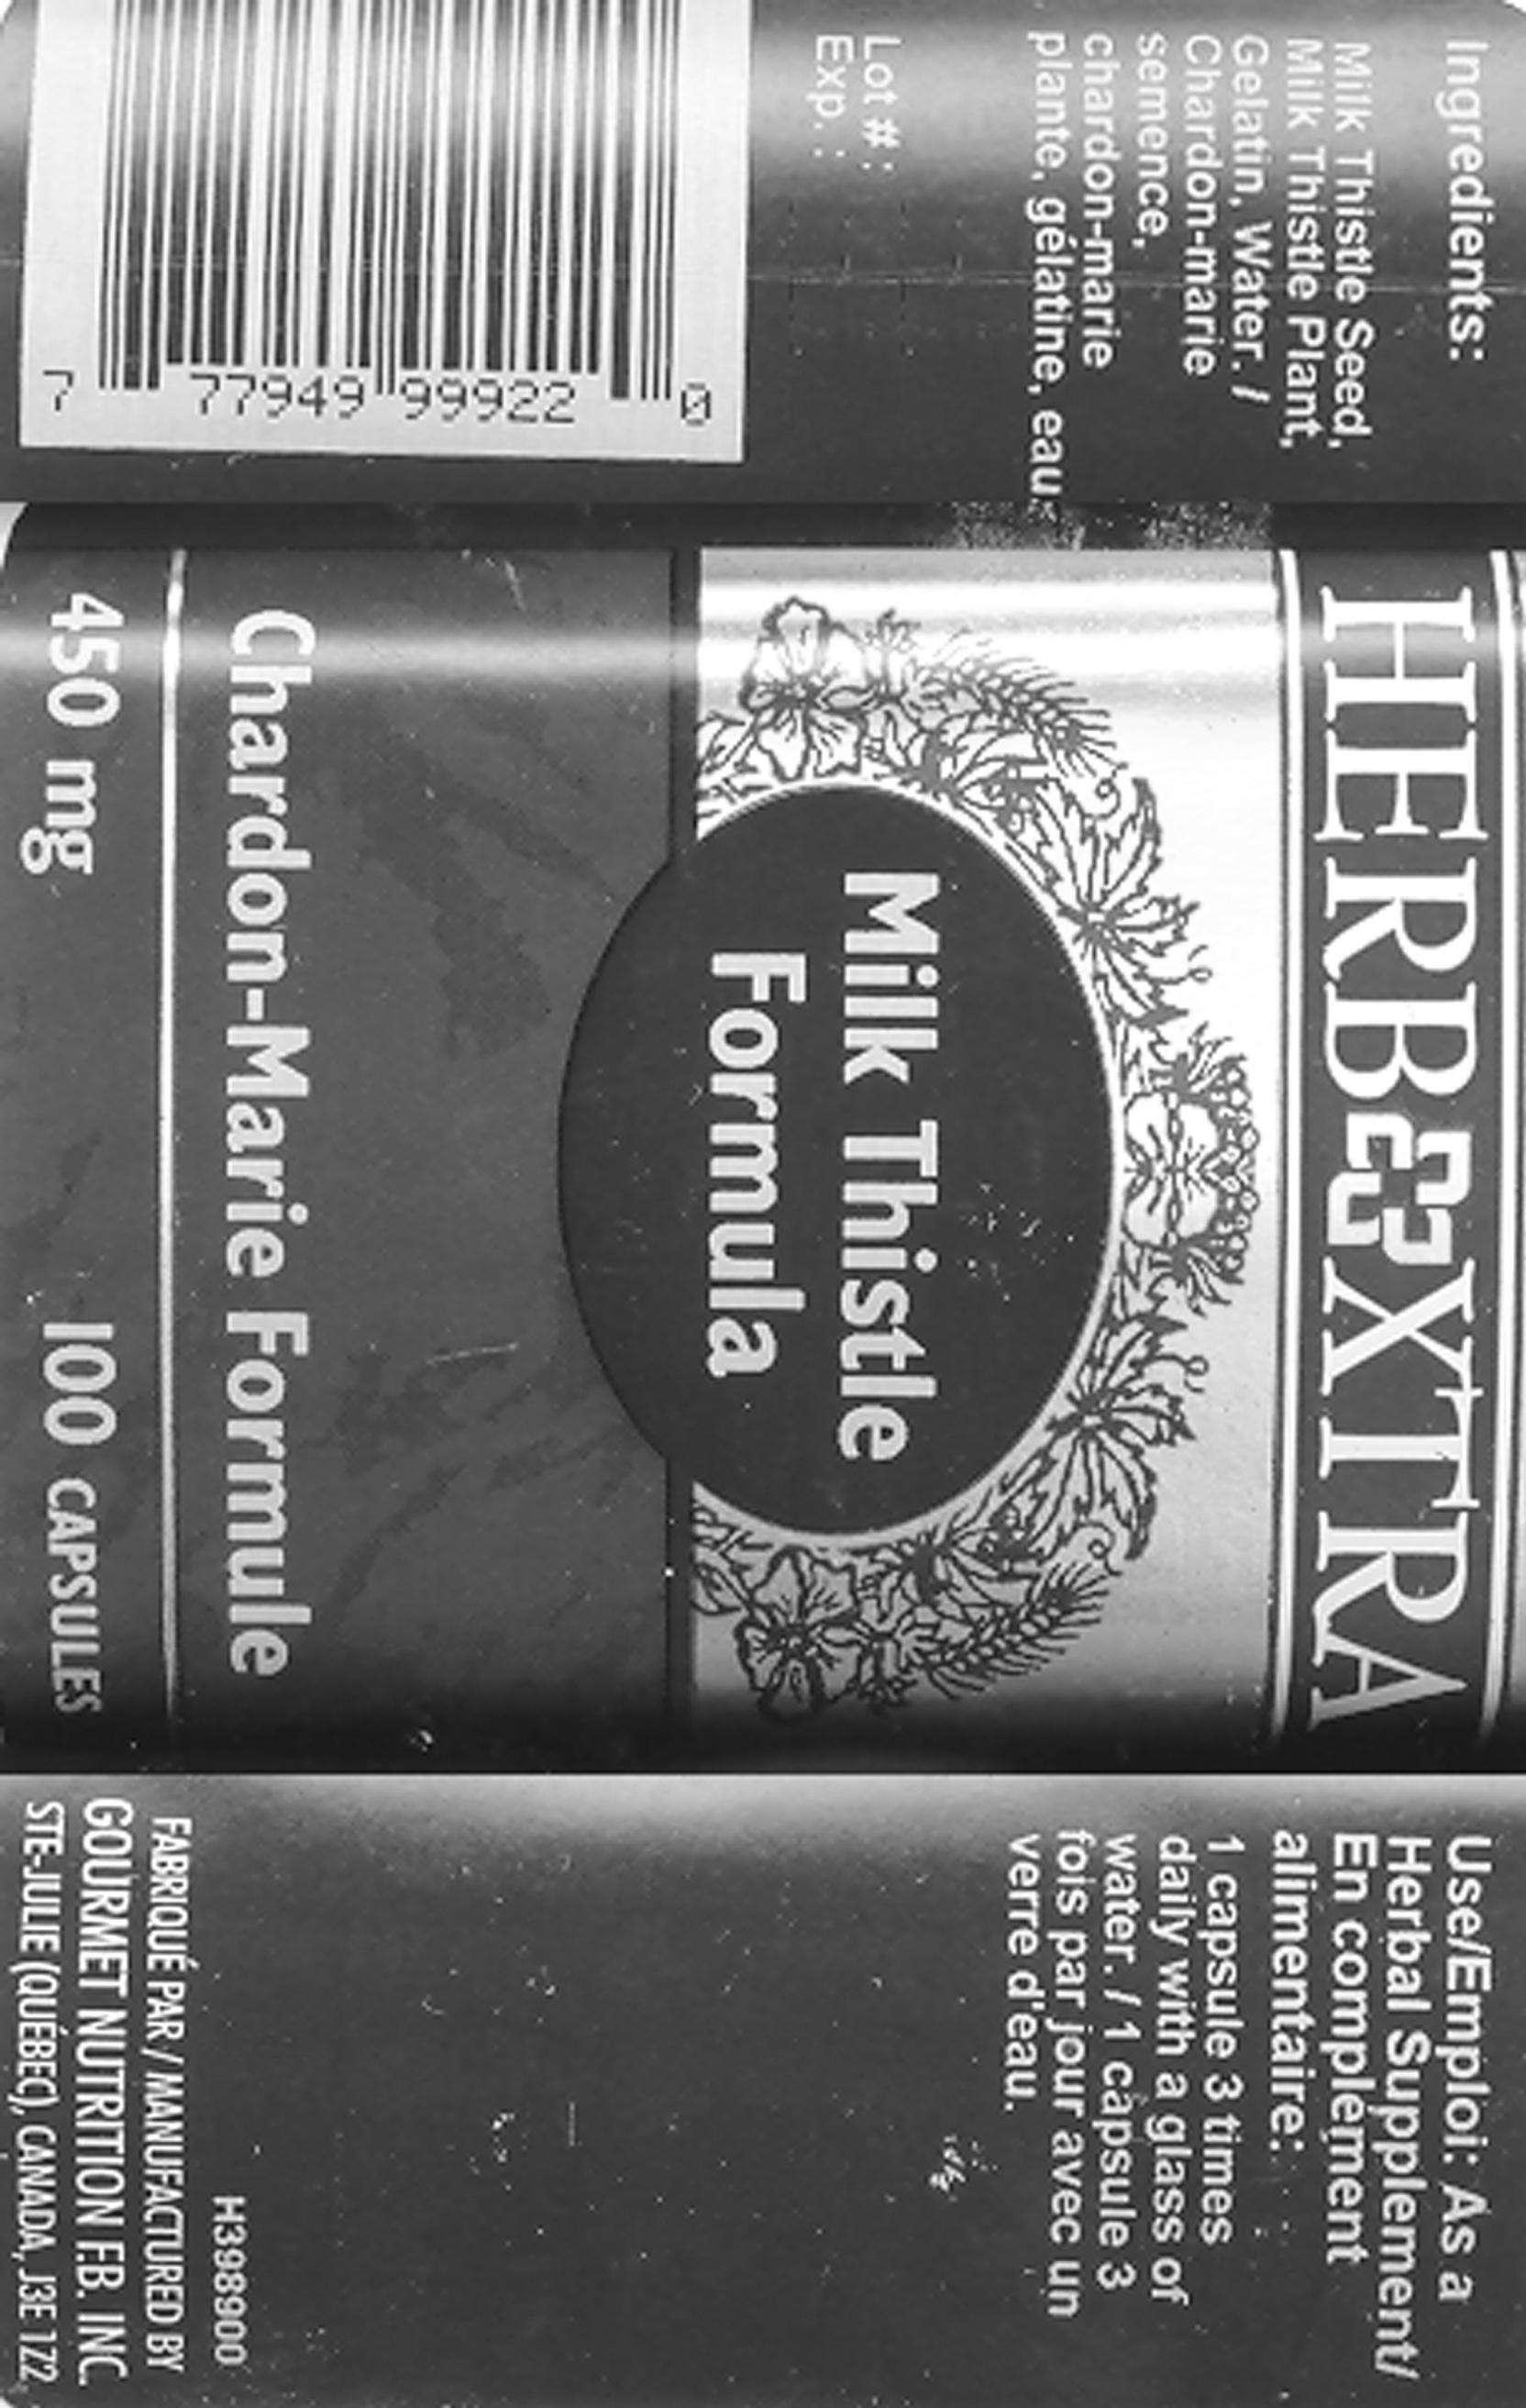 Milk Thistle Seed 225 mg - Milk Thistle Plant 225 mg - Label